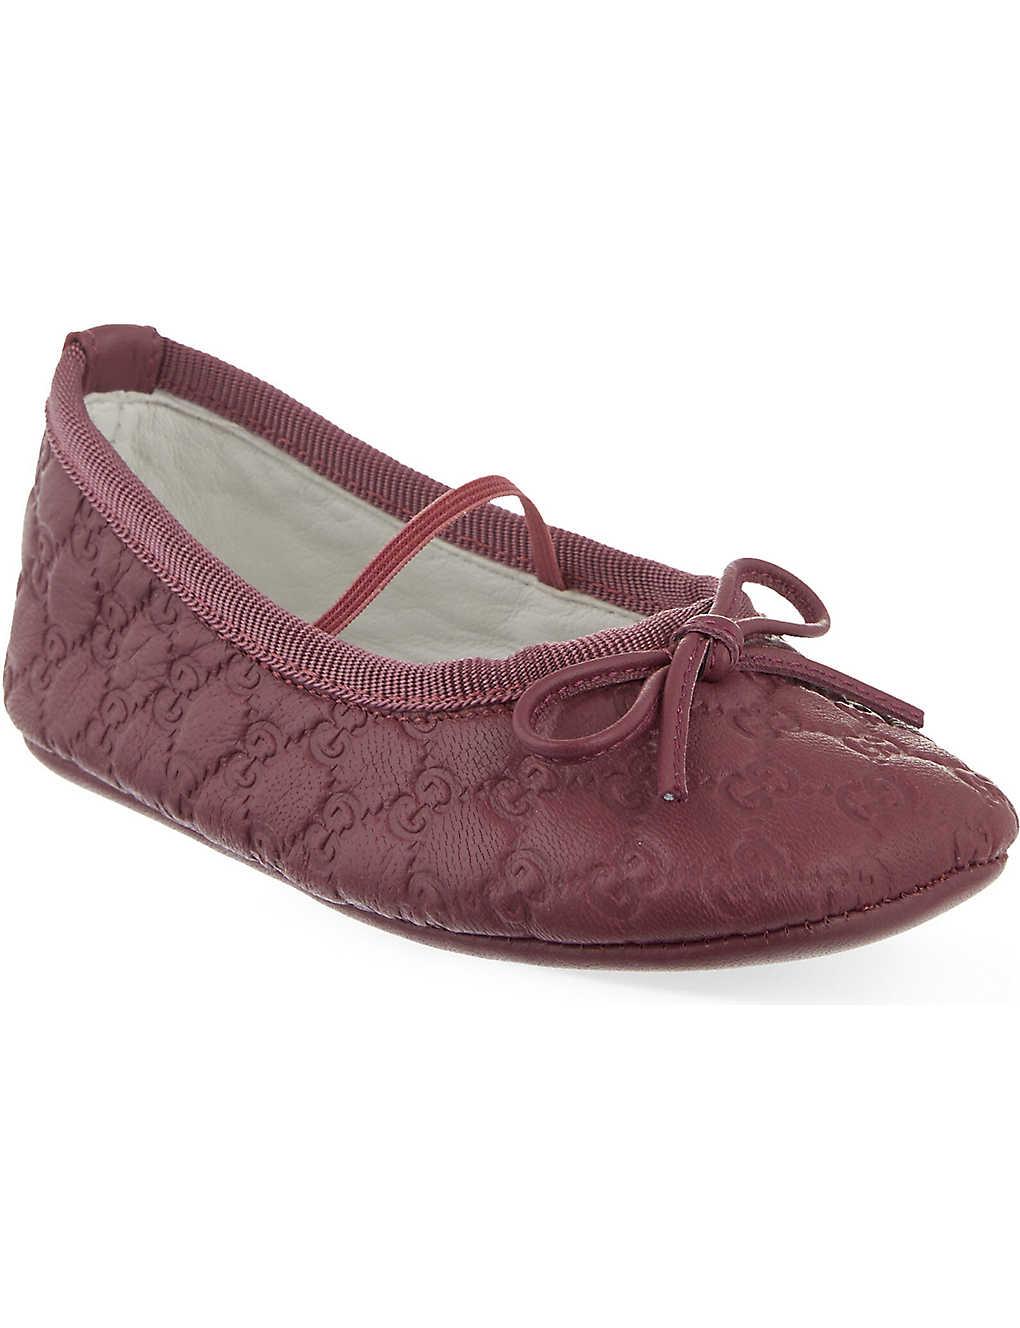 GUCCI - Baby Ali leather crib shoes 4-6 months  5e0eba6c2